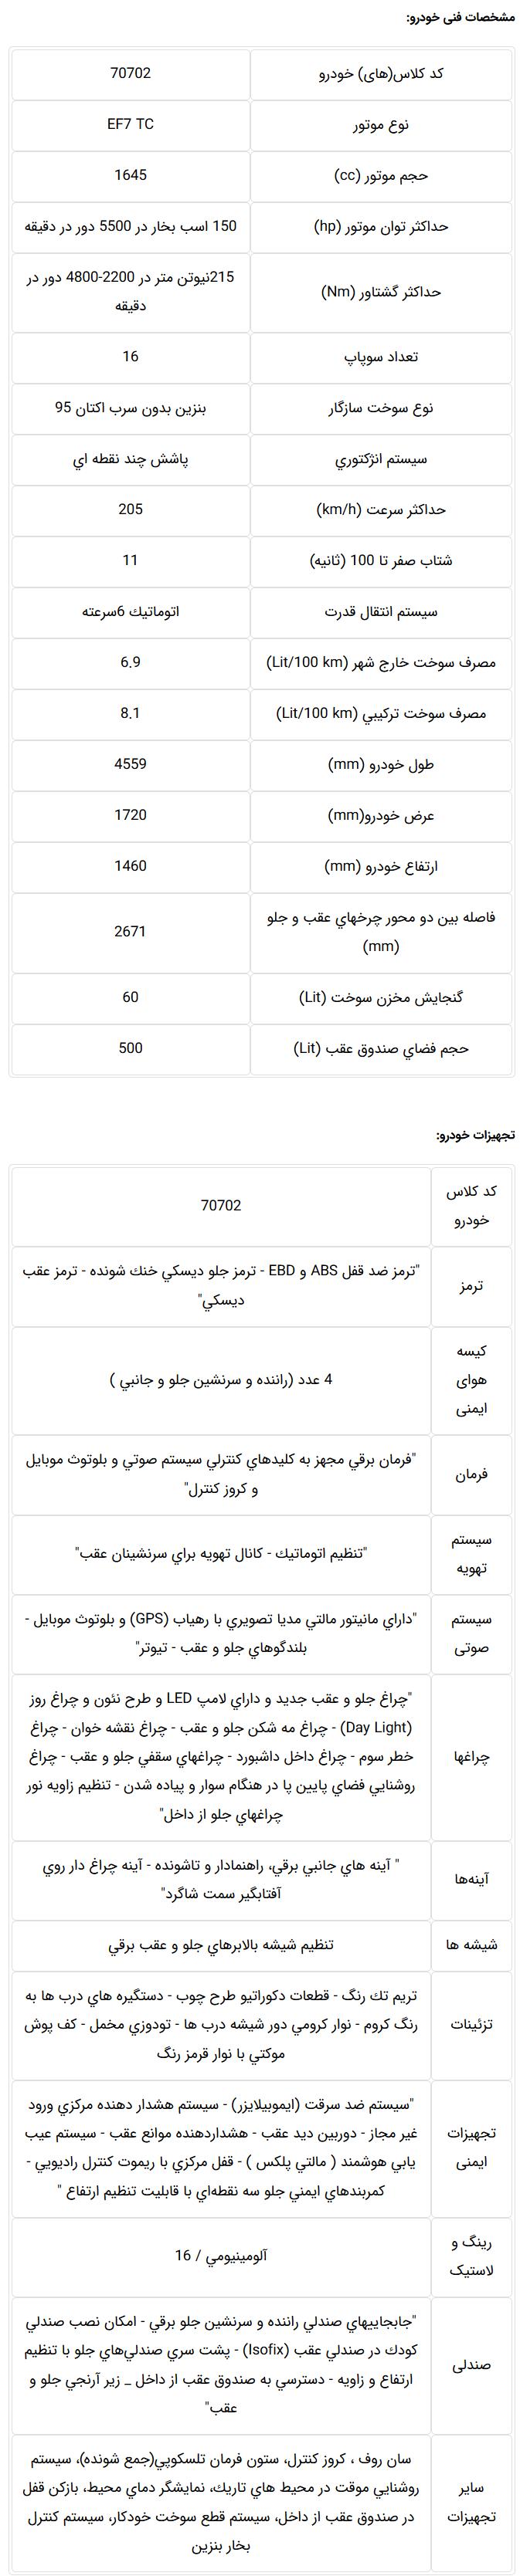 Screenshot_2020-09-07 مشخصات تکمیلی خودرو دنا پلاس توربو اتوماتیک منتشر شد.png